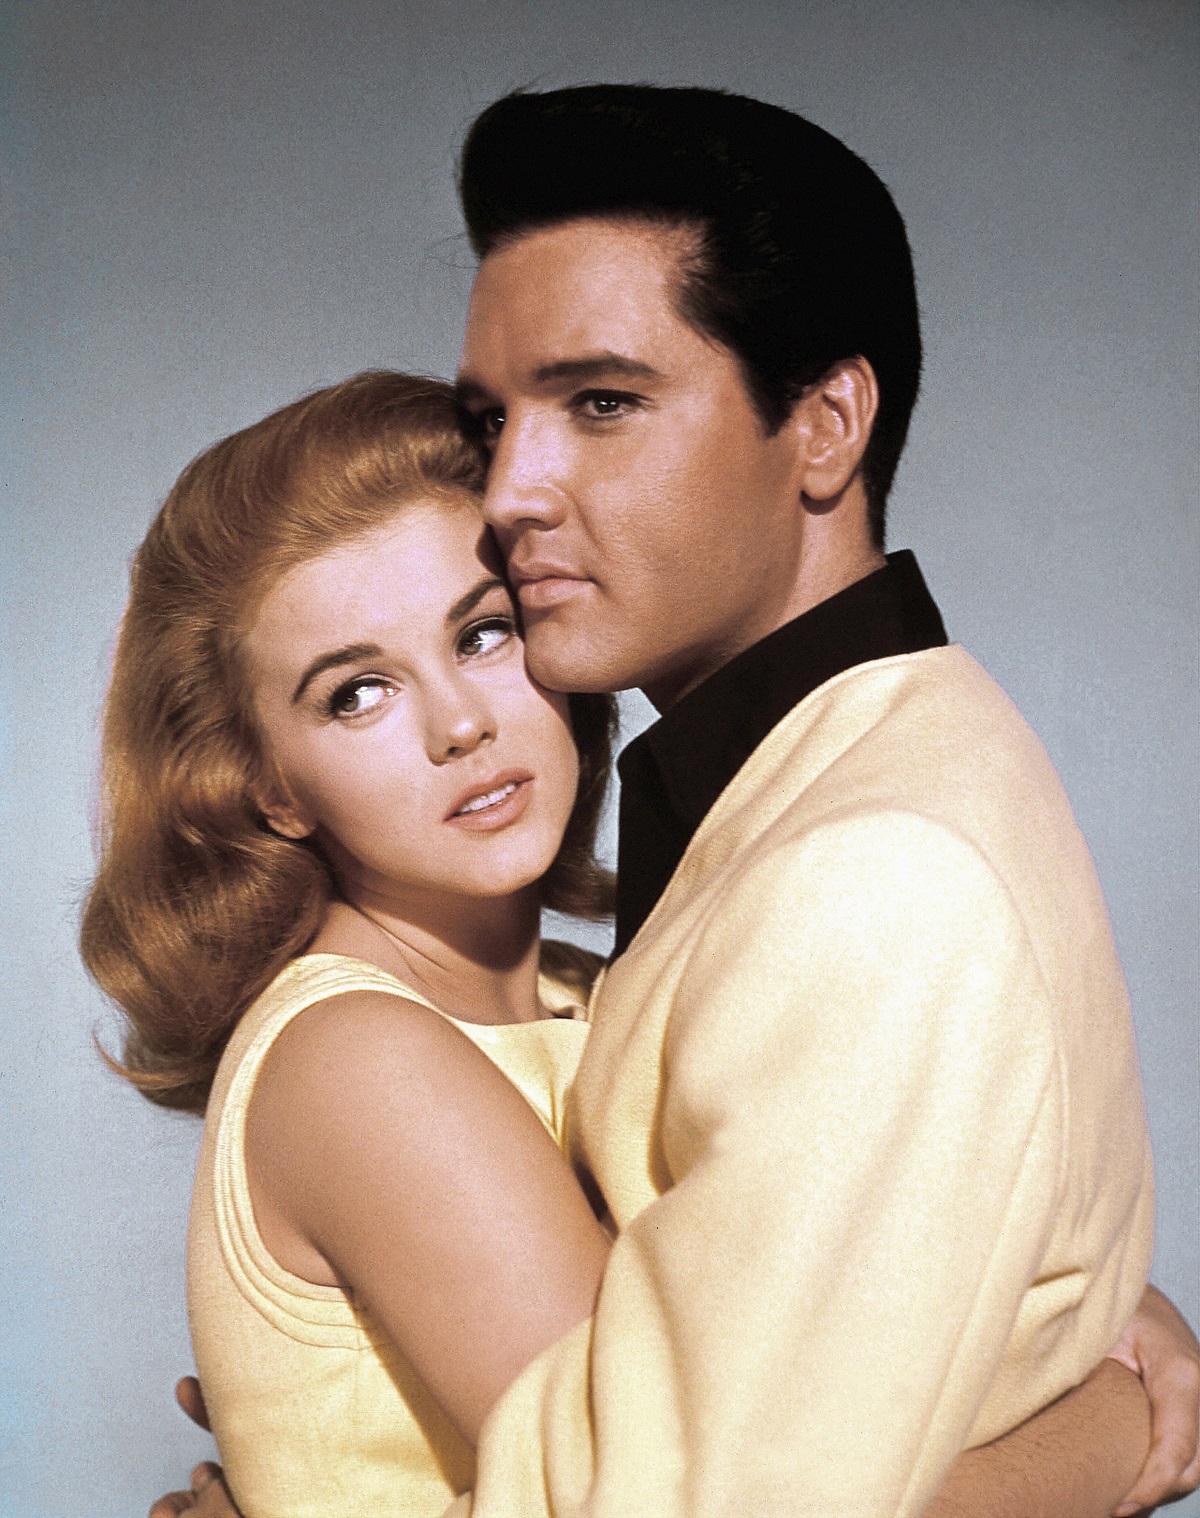 Ann-Margret and Elvis Presley holding each other in a promotional still for 'Viva Las Vegas'